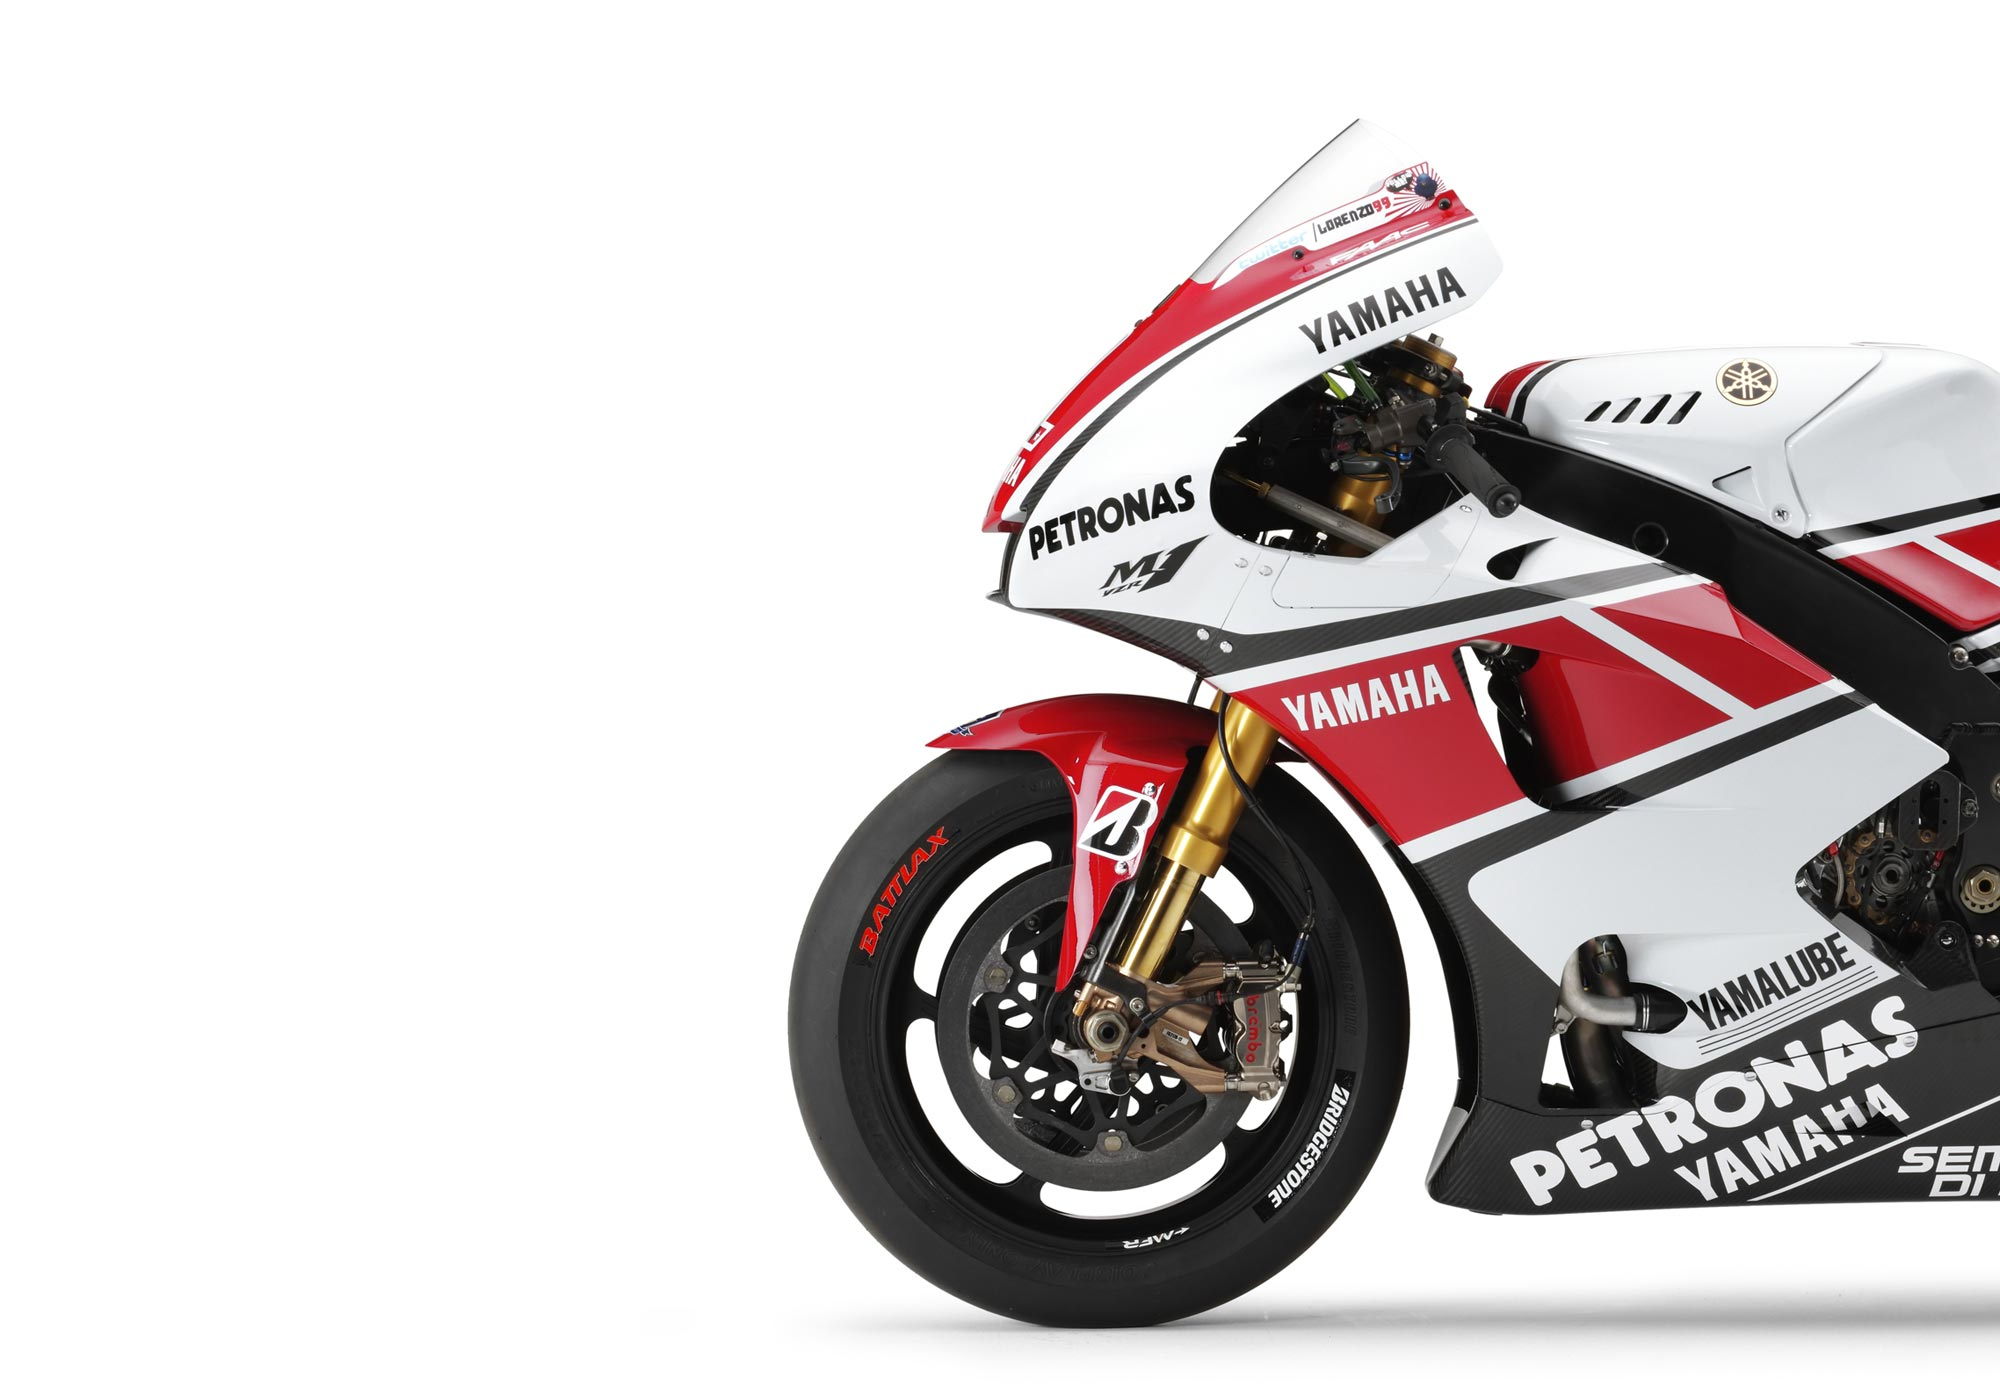 MotoGP: Yamaha Loses Petronas Sponsorship - Asphalt & Rubber